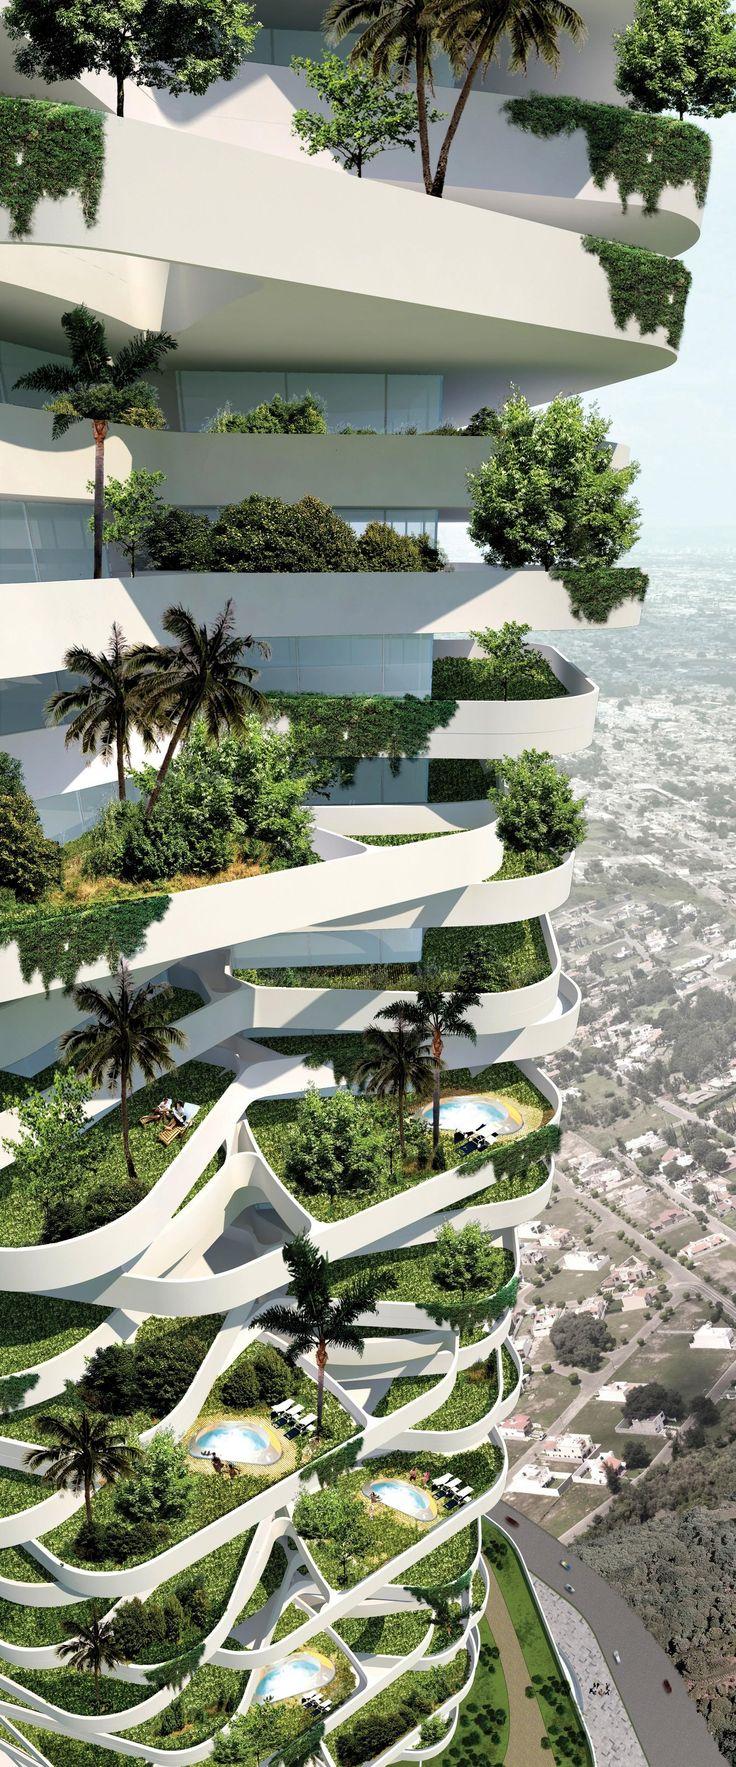 Keeping the city green, 21st century style. High rise. Skyscraper. Urban garden. Green roof. Environment. Environmentalist. Architecture. Modern architecture. Modern living. Green city. Modern city.